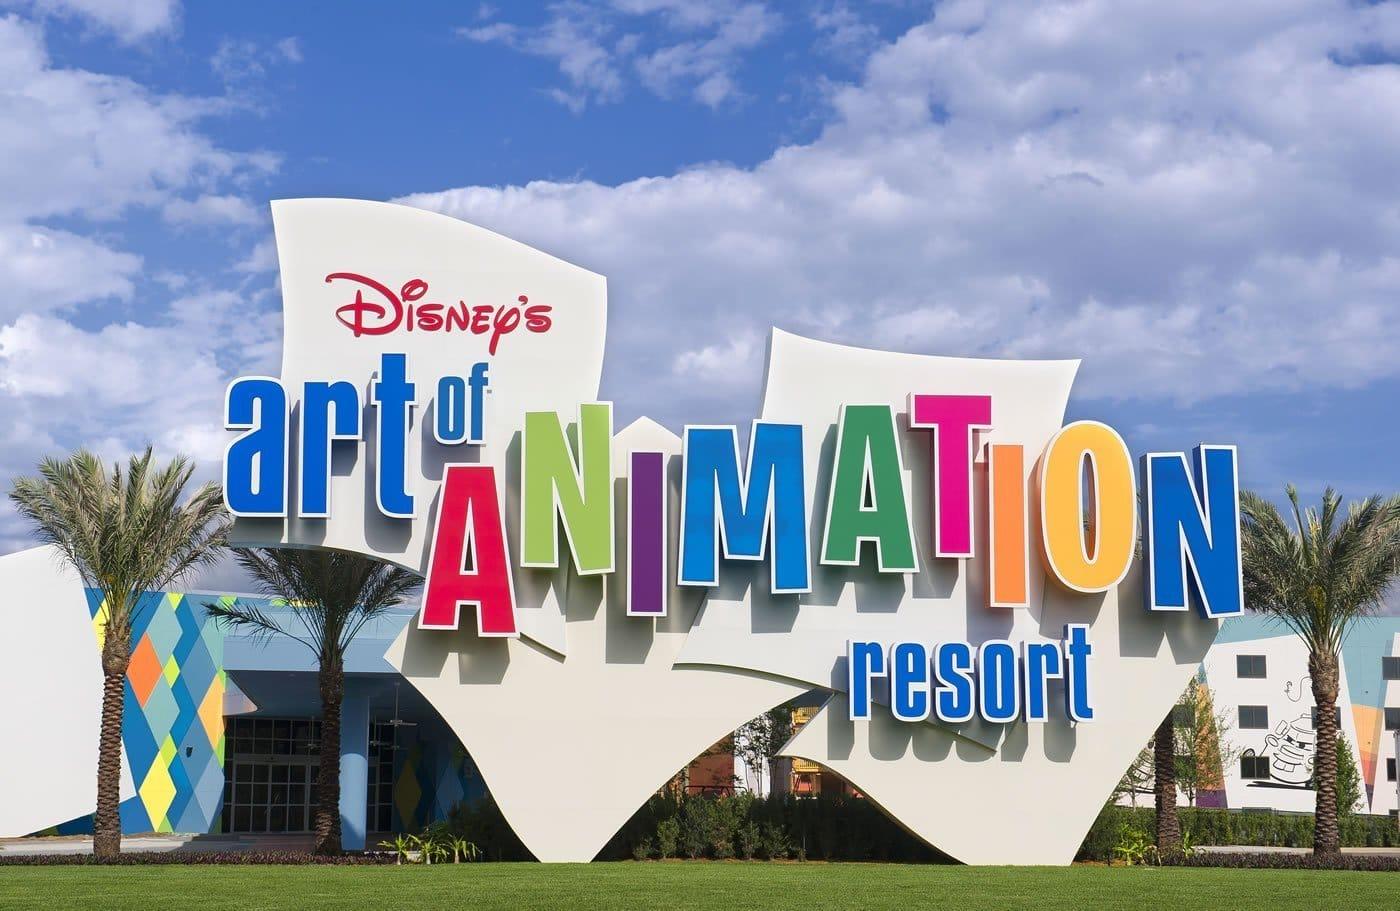 Hotel Disney Art of Animation